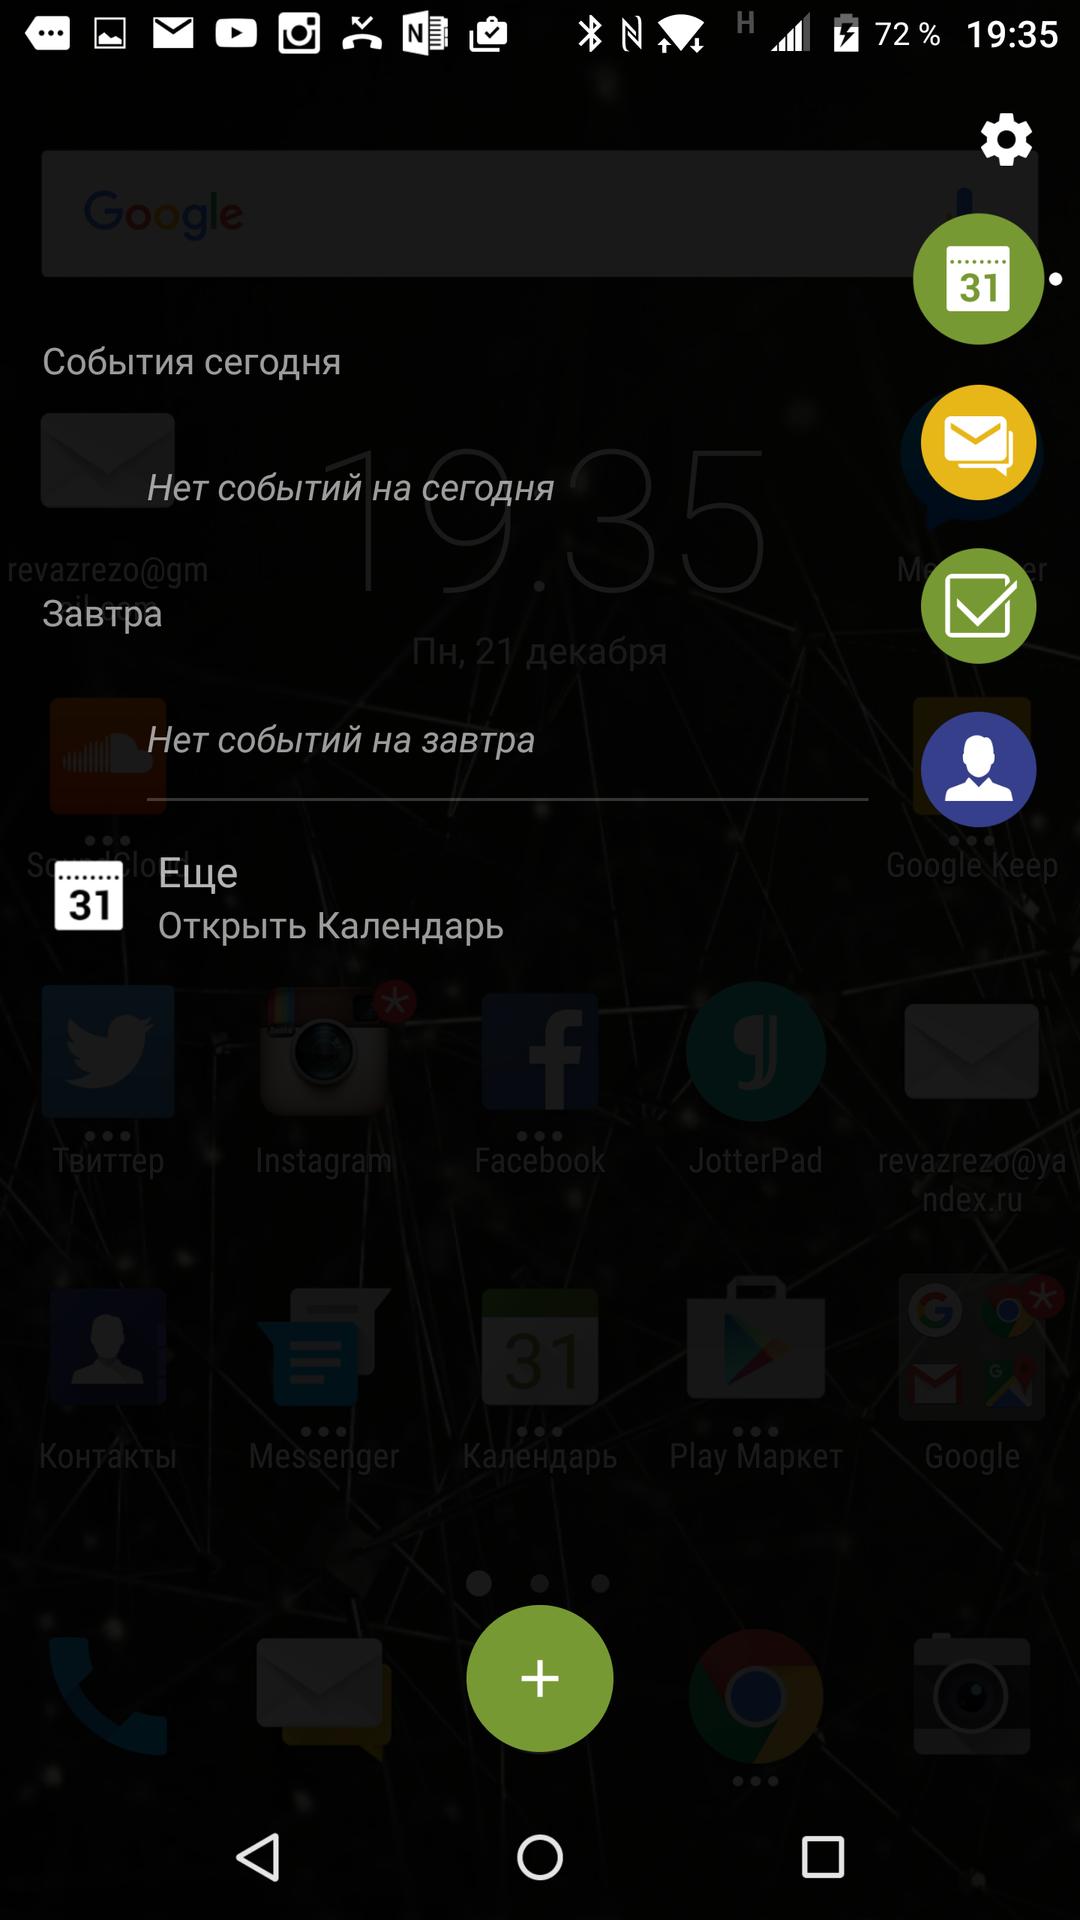 screenshot2015-12-21-19-35-05-1080x1920